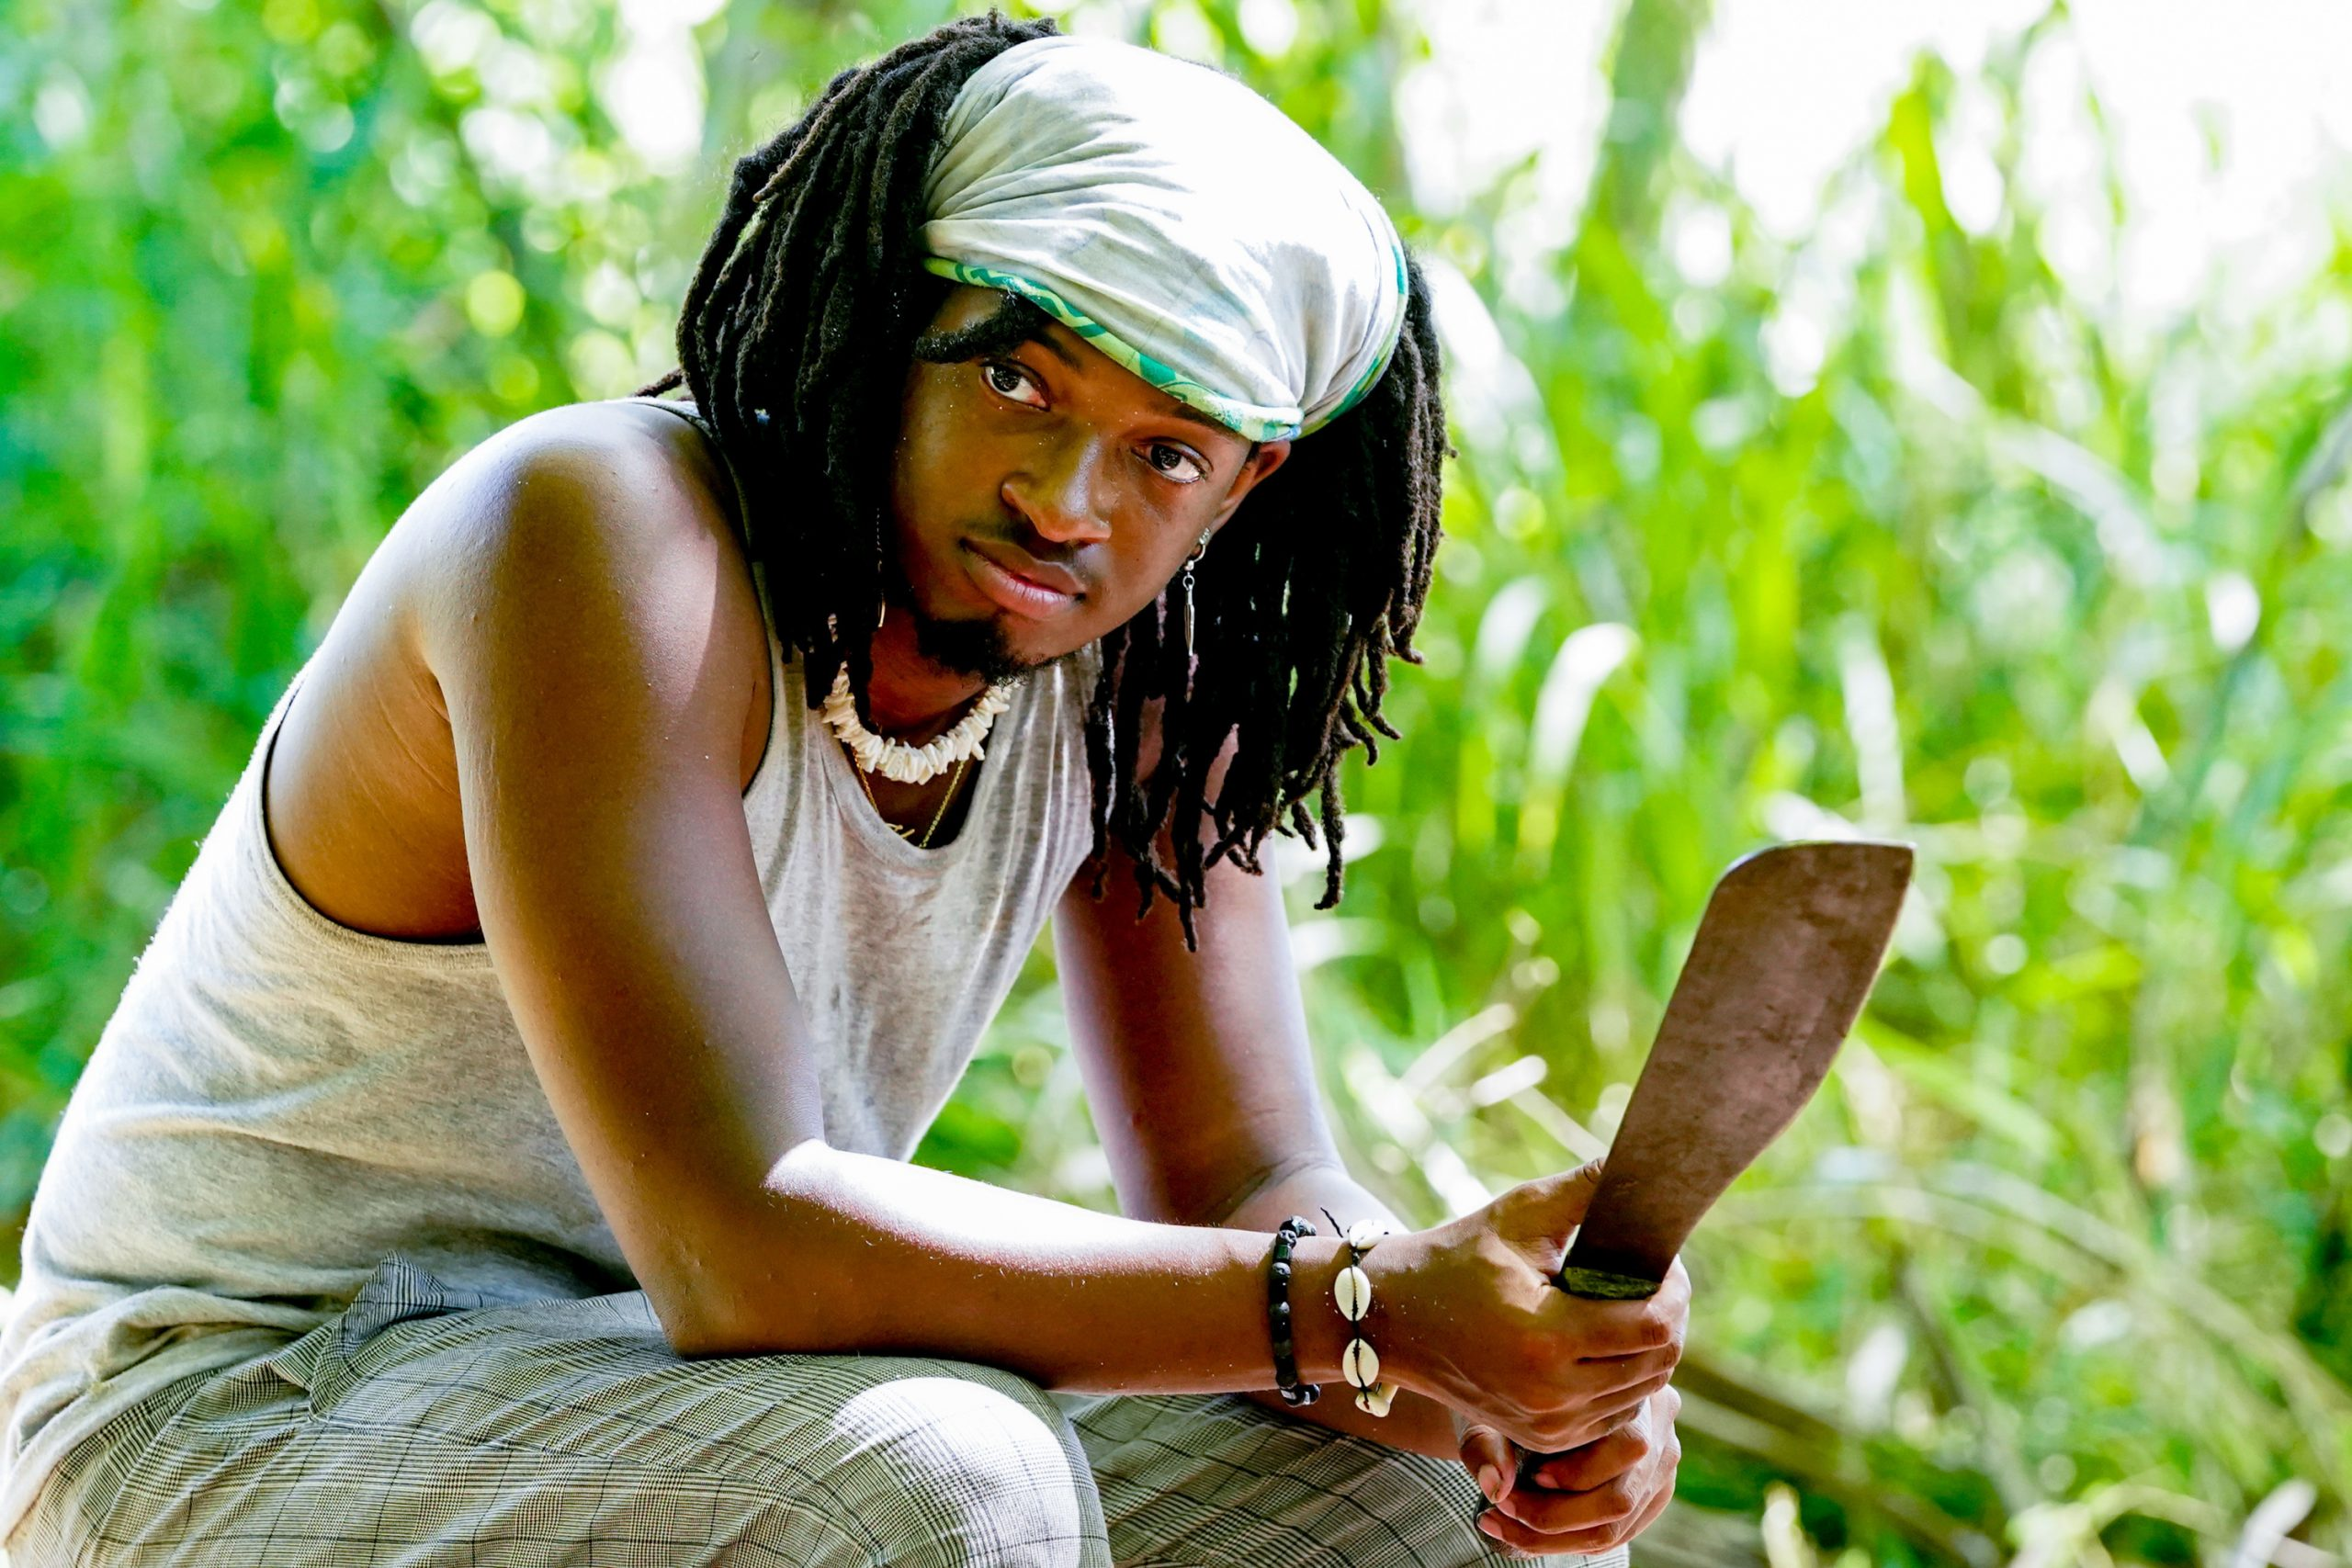 Jairus Robinson on 'Big Brother 23' sits down holding a machete.